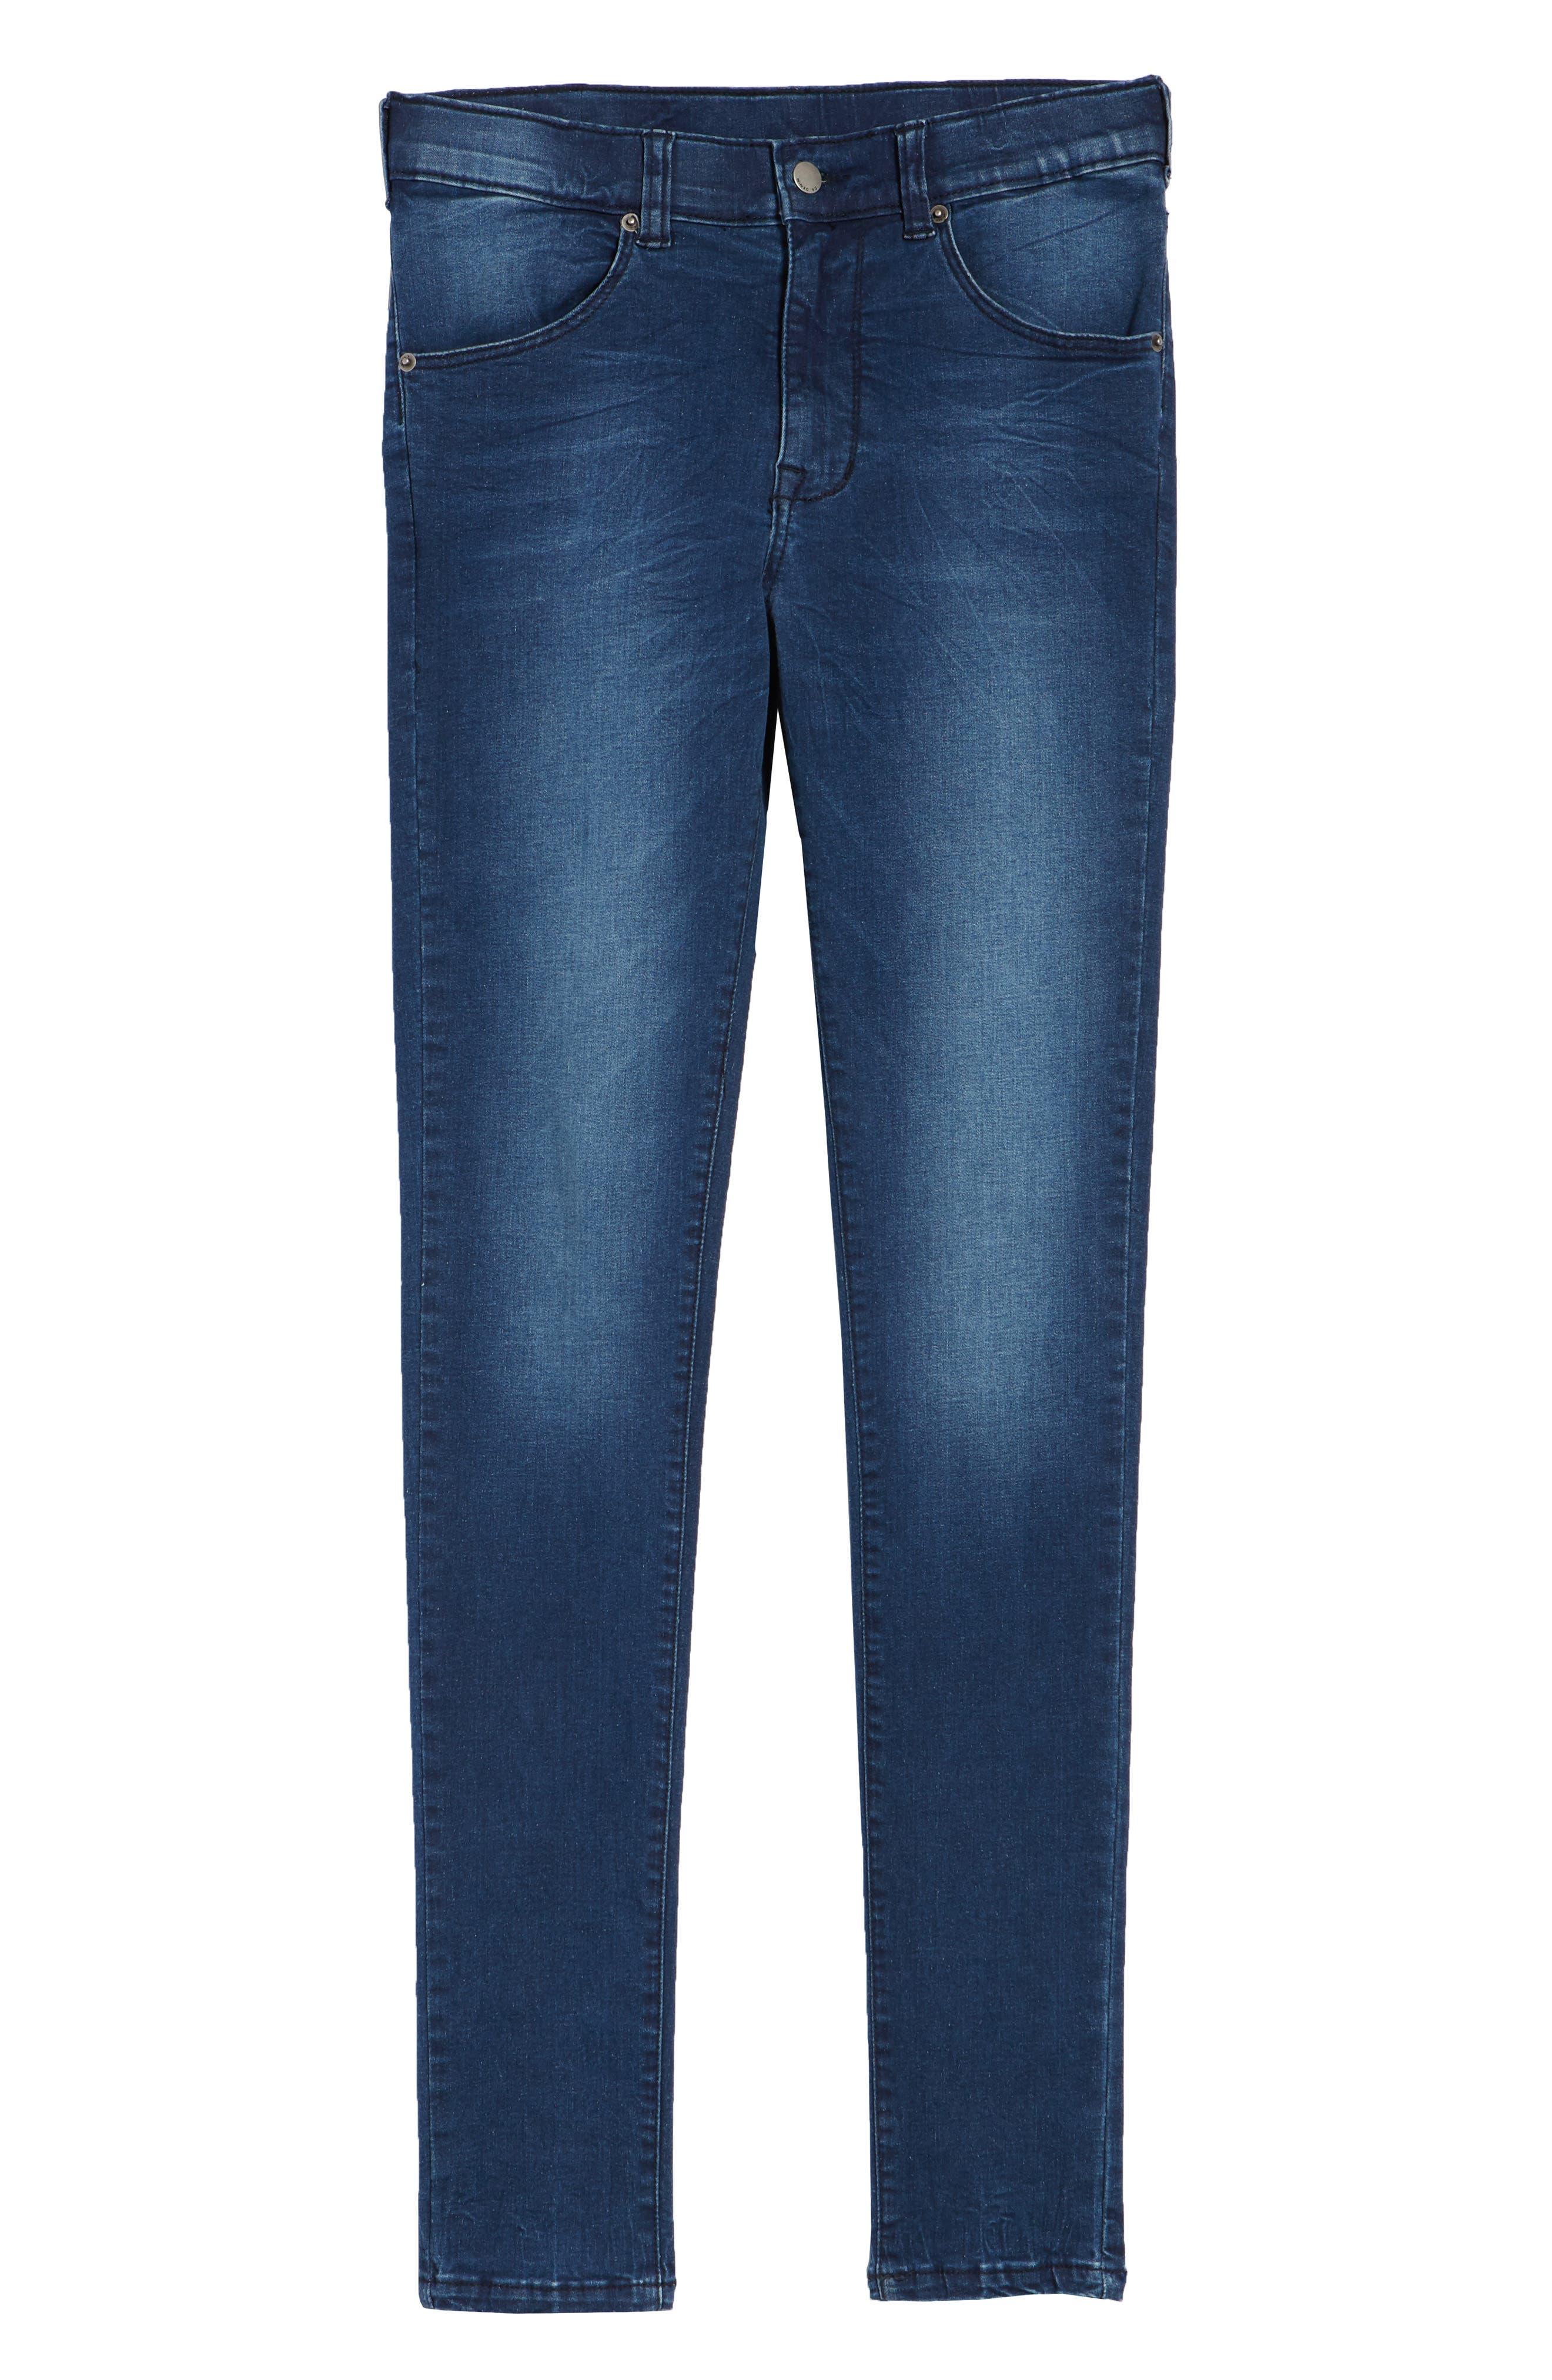 Leroy Skinny Fit Jeans,                             Alternate thumbnail 6, color,                             WORN DARK BLUE